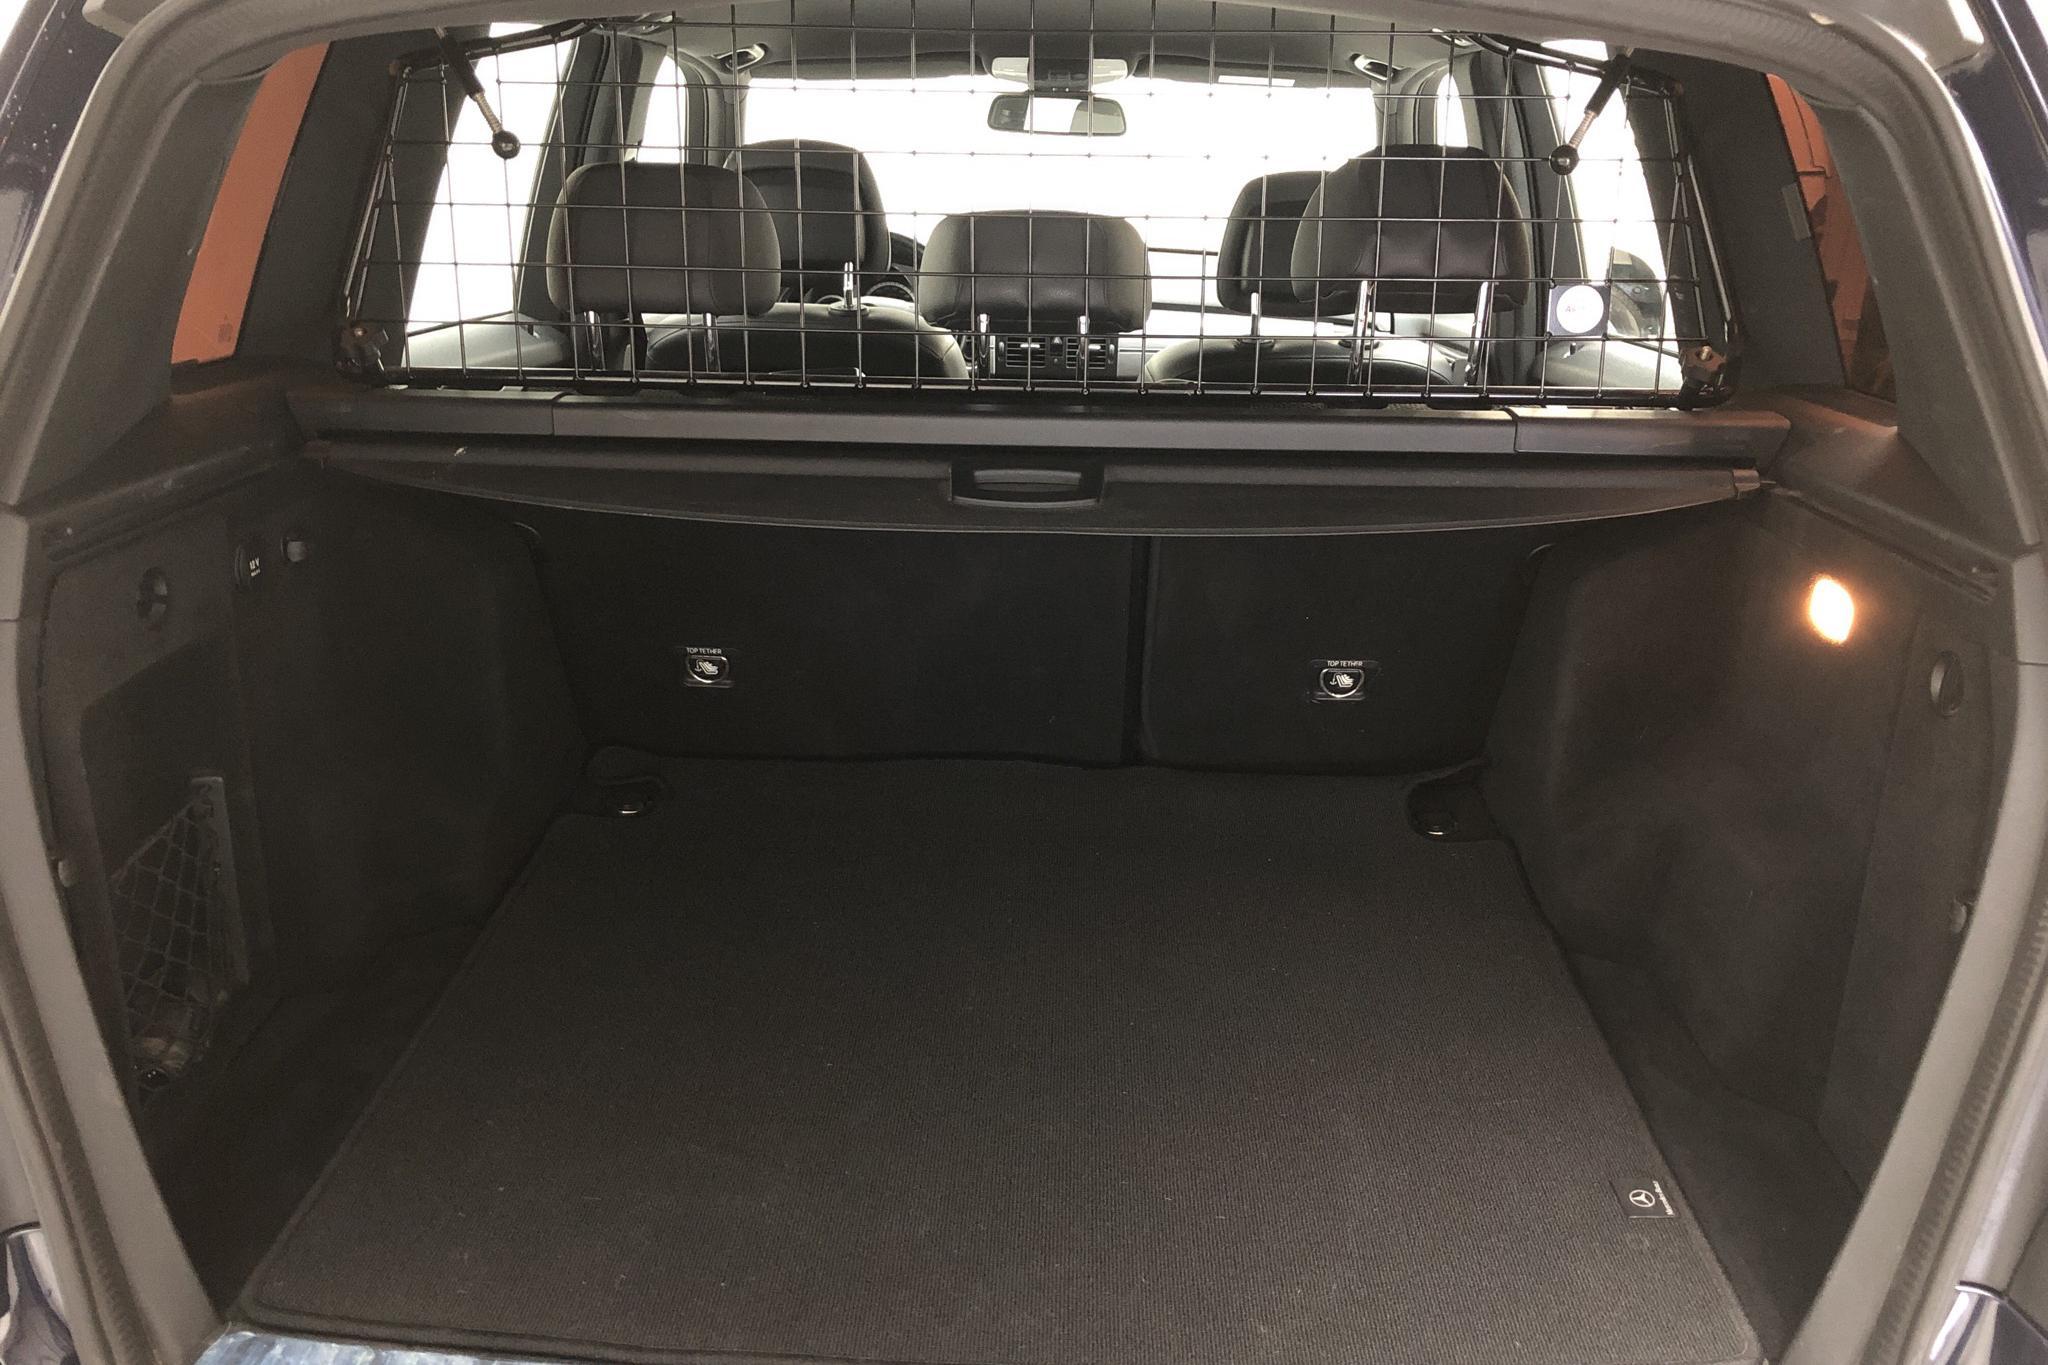 Mercedes GLK 220 CDI BlueEFFICIENCY 4MATIC (170hk) - 22 666 mil - Automat - Dark Blue - 2012